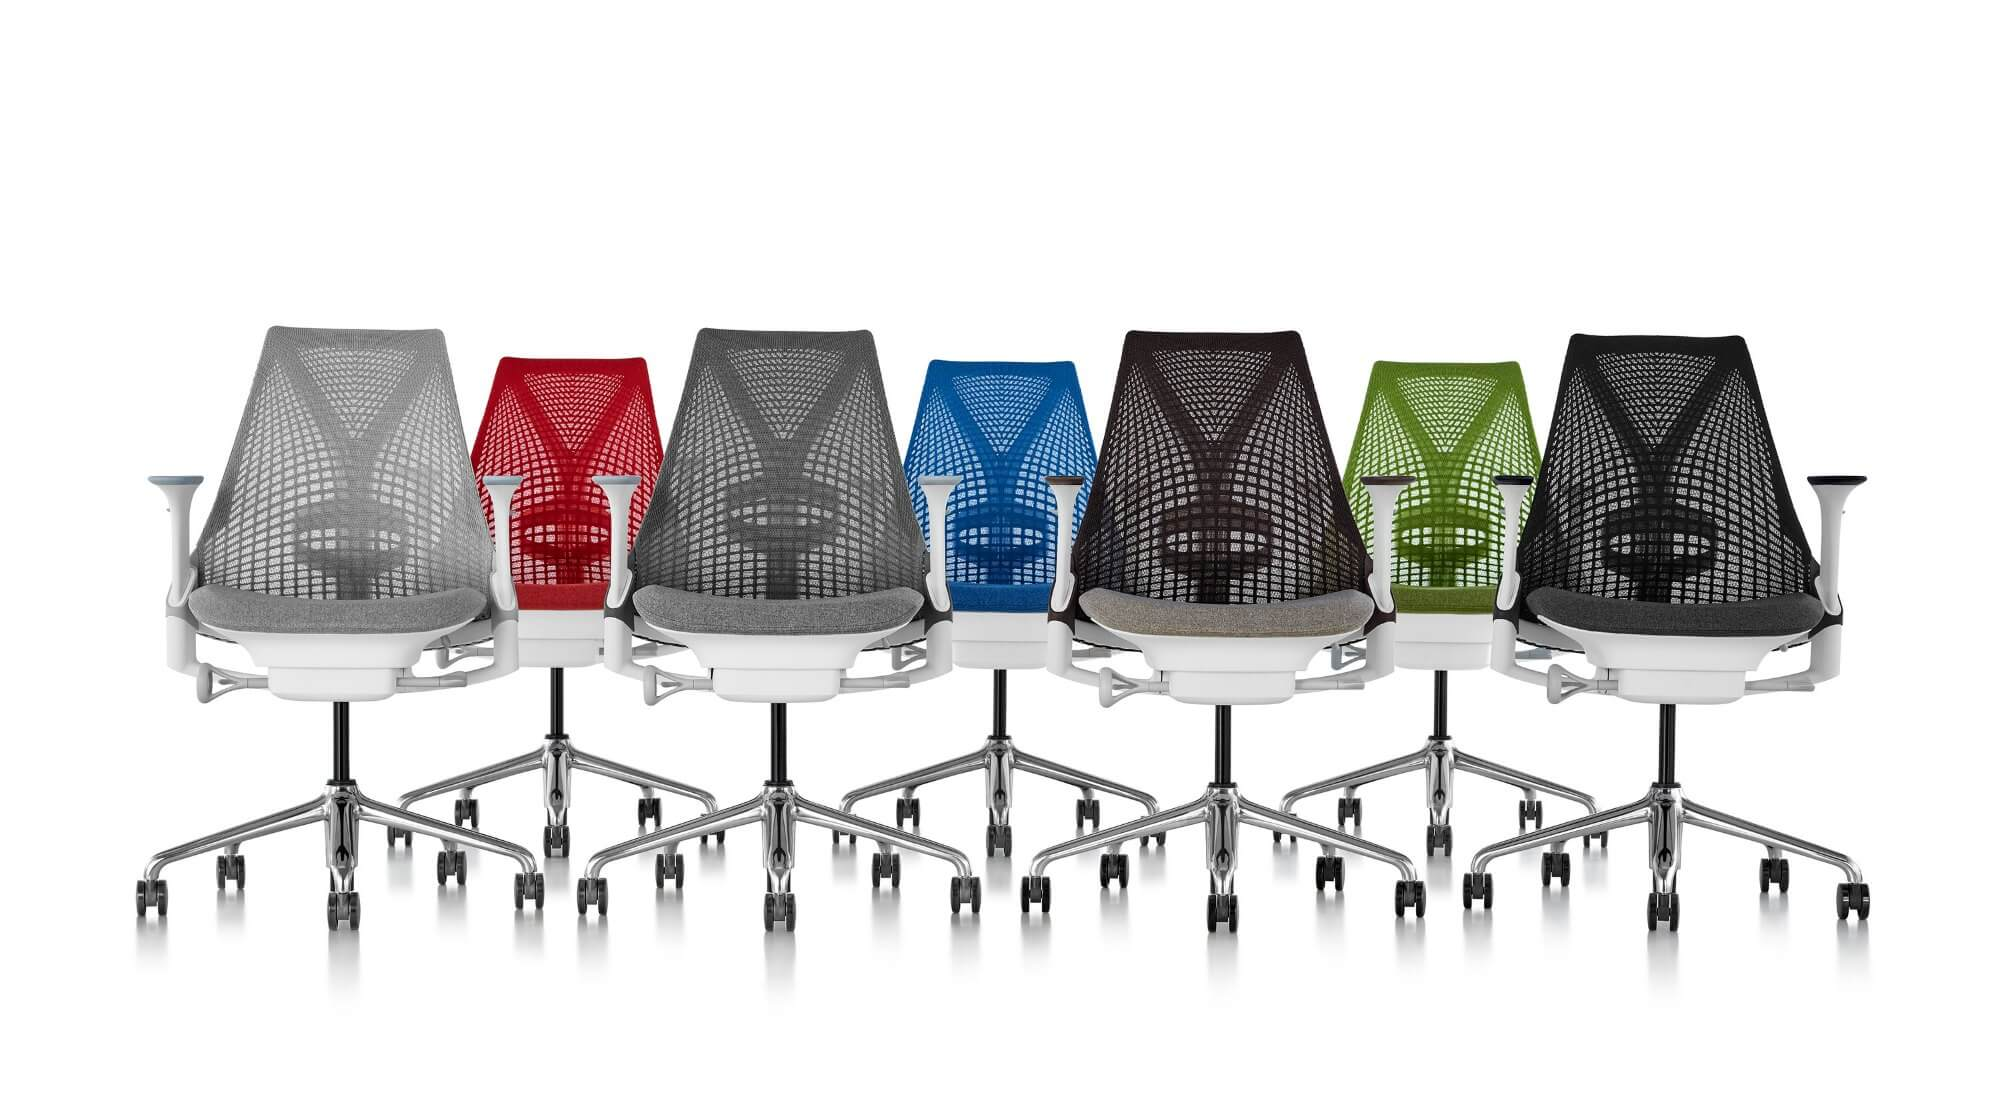 Sillas de oficina ergonomicas herman miller sayl adeyaka for Sillas oficina ergonomicas barcelona